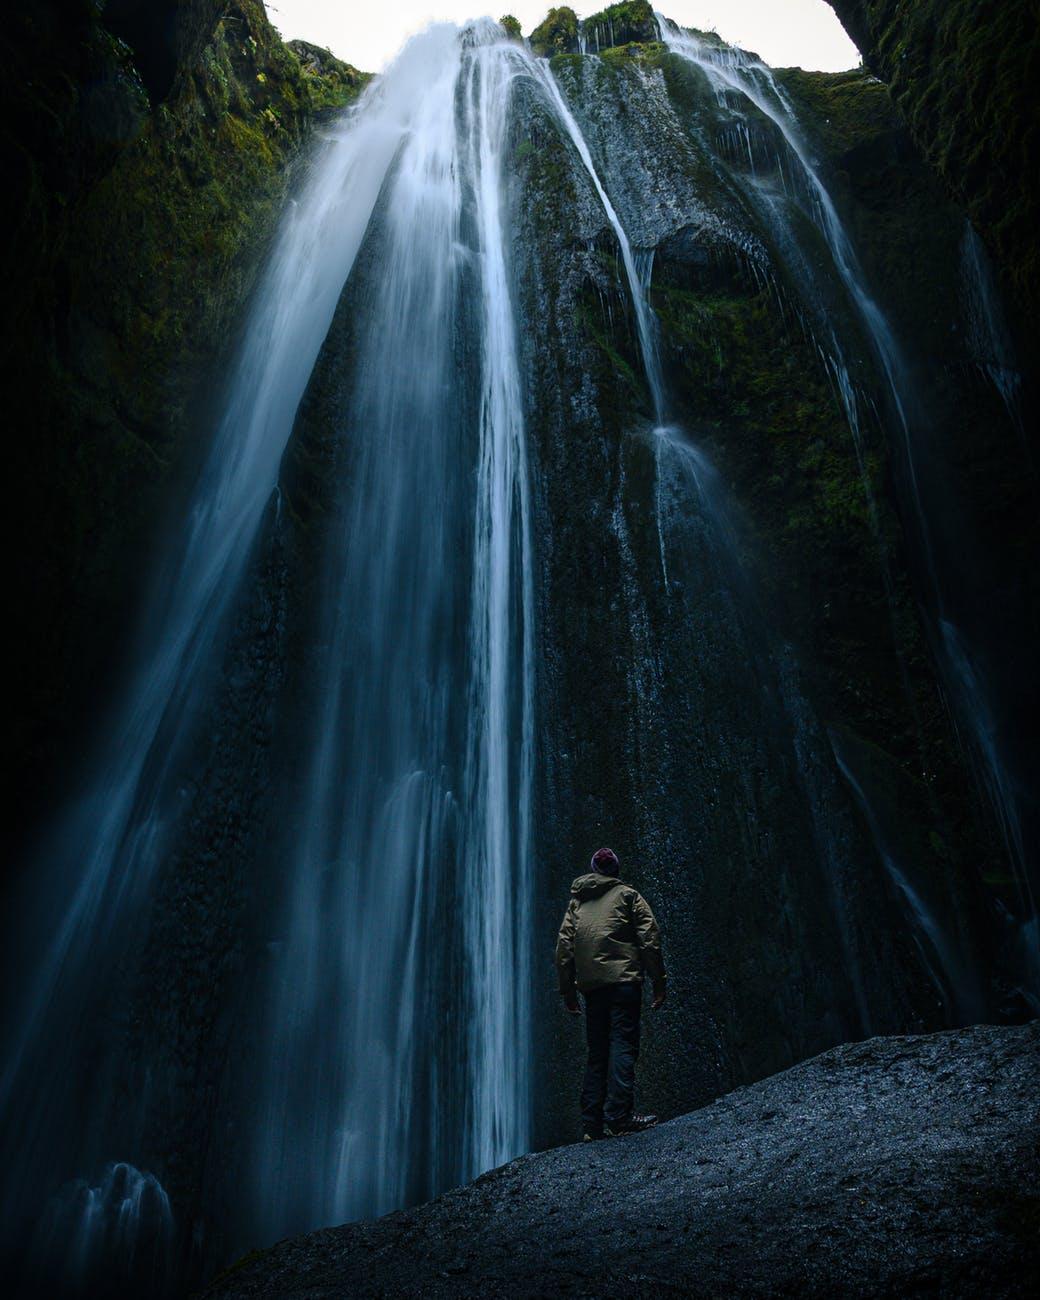 photo of man standing near the waterfalls